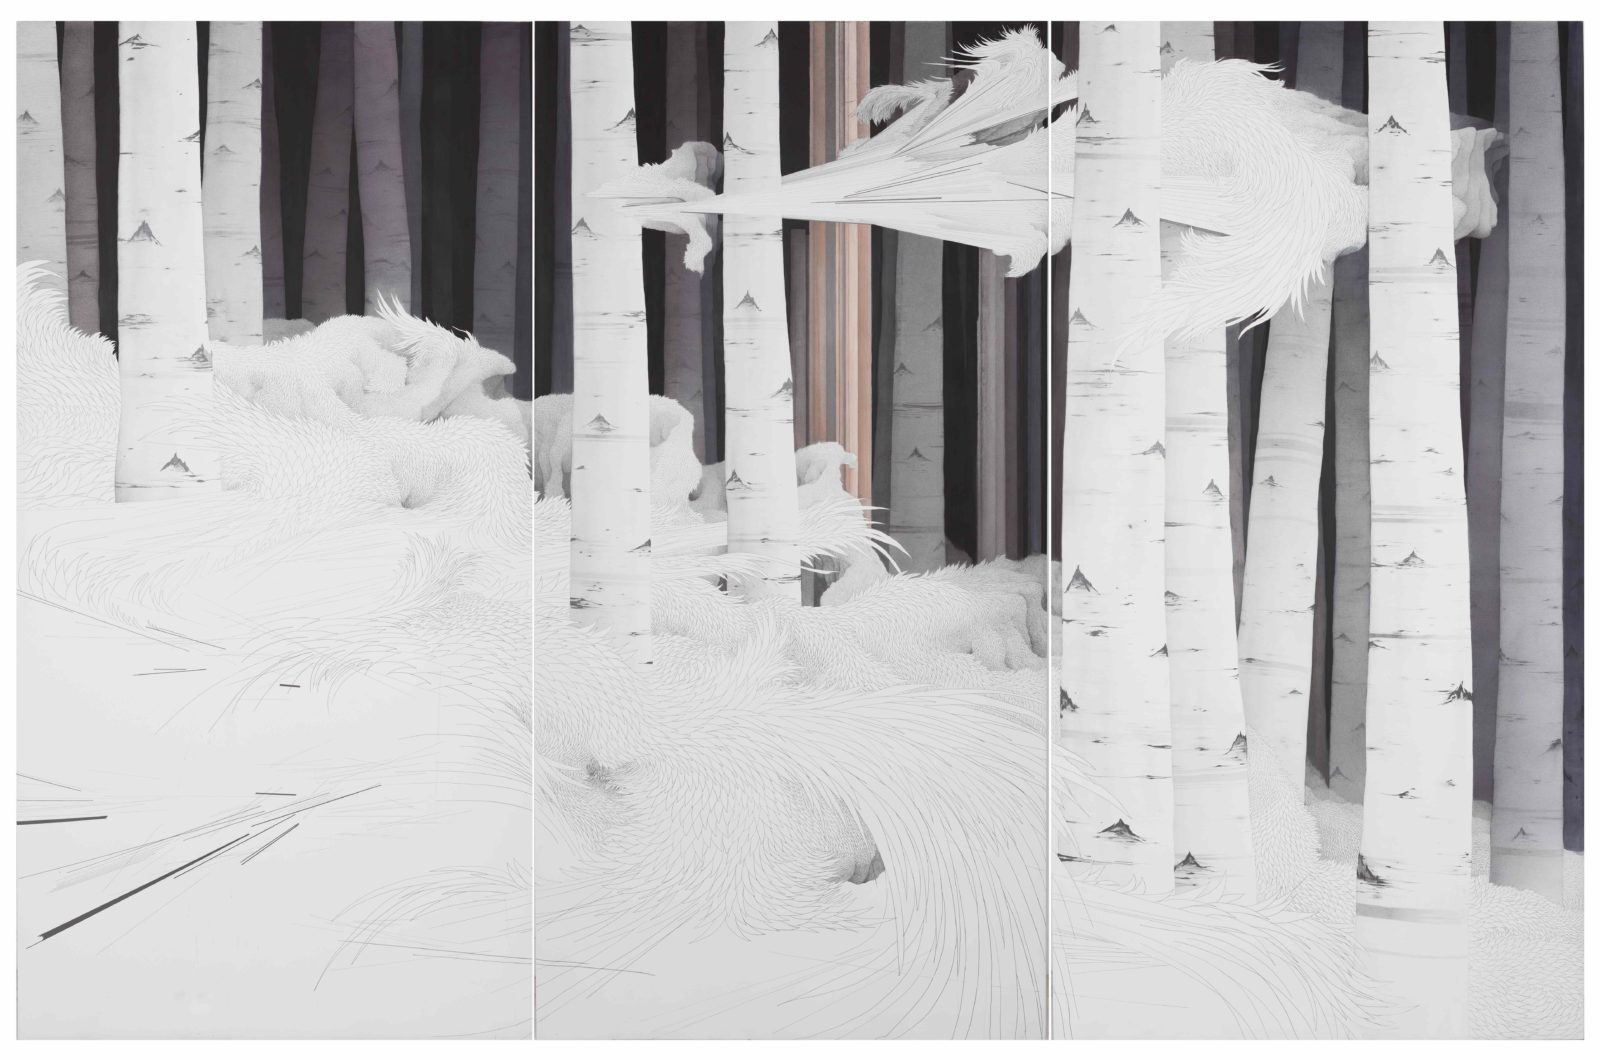 MIN Jung-yeon Fragment de l'installation Tissage